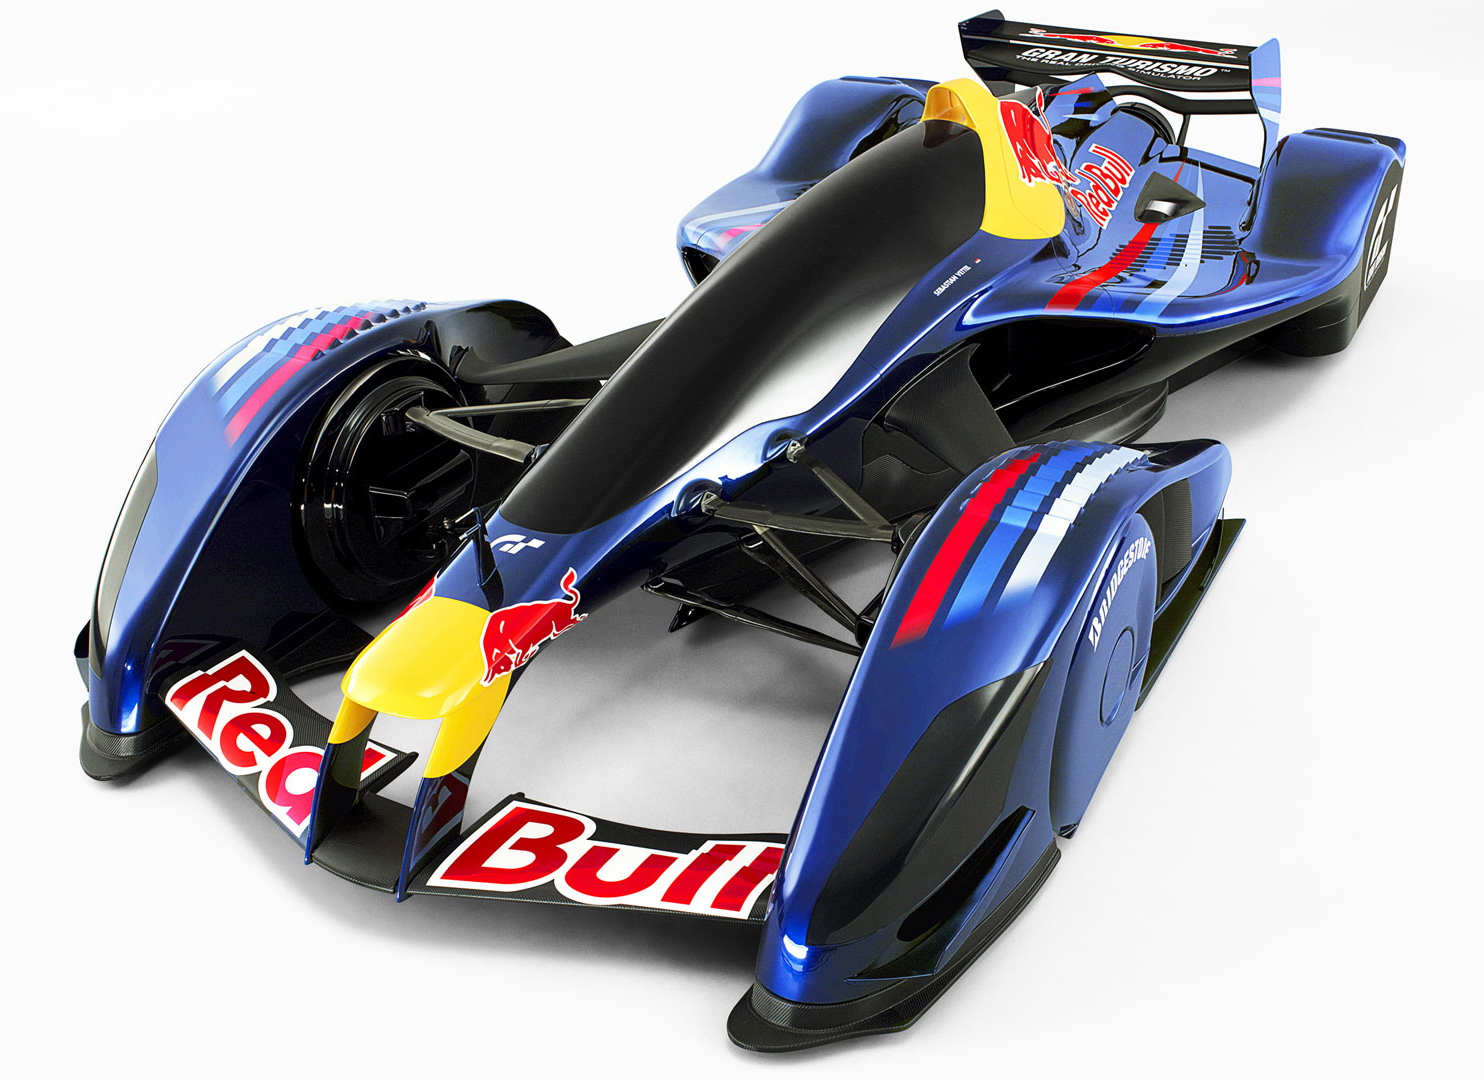 FIA、メルセデスのキャノピーの評価を推進: F1の保護コックピット